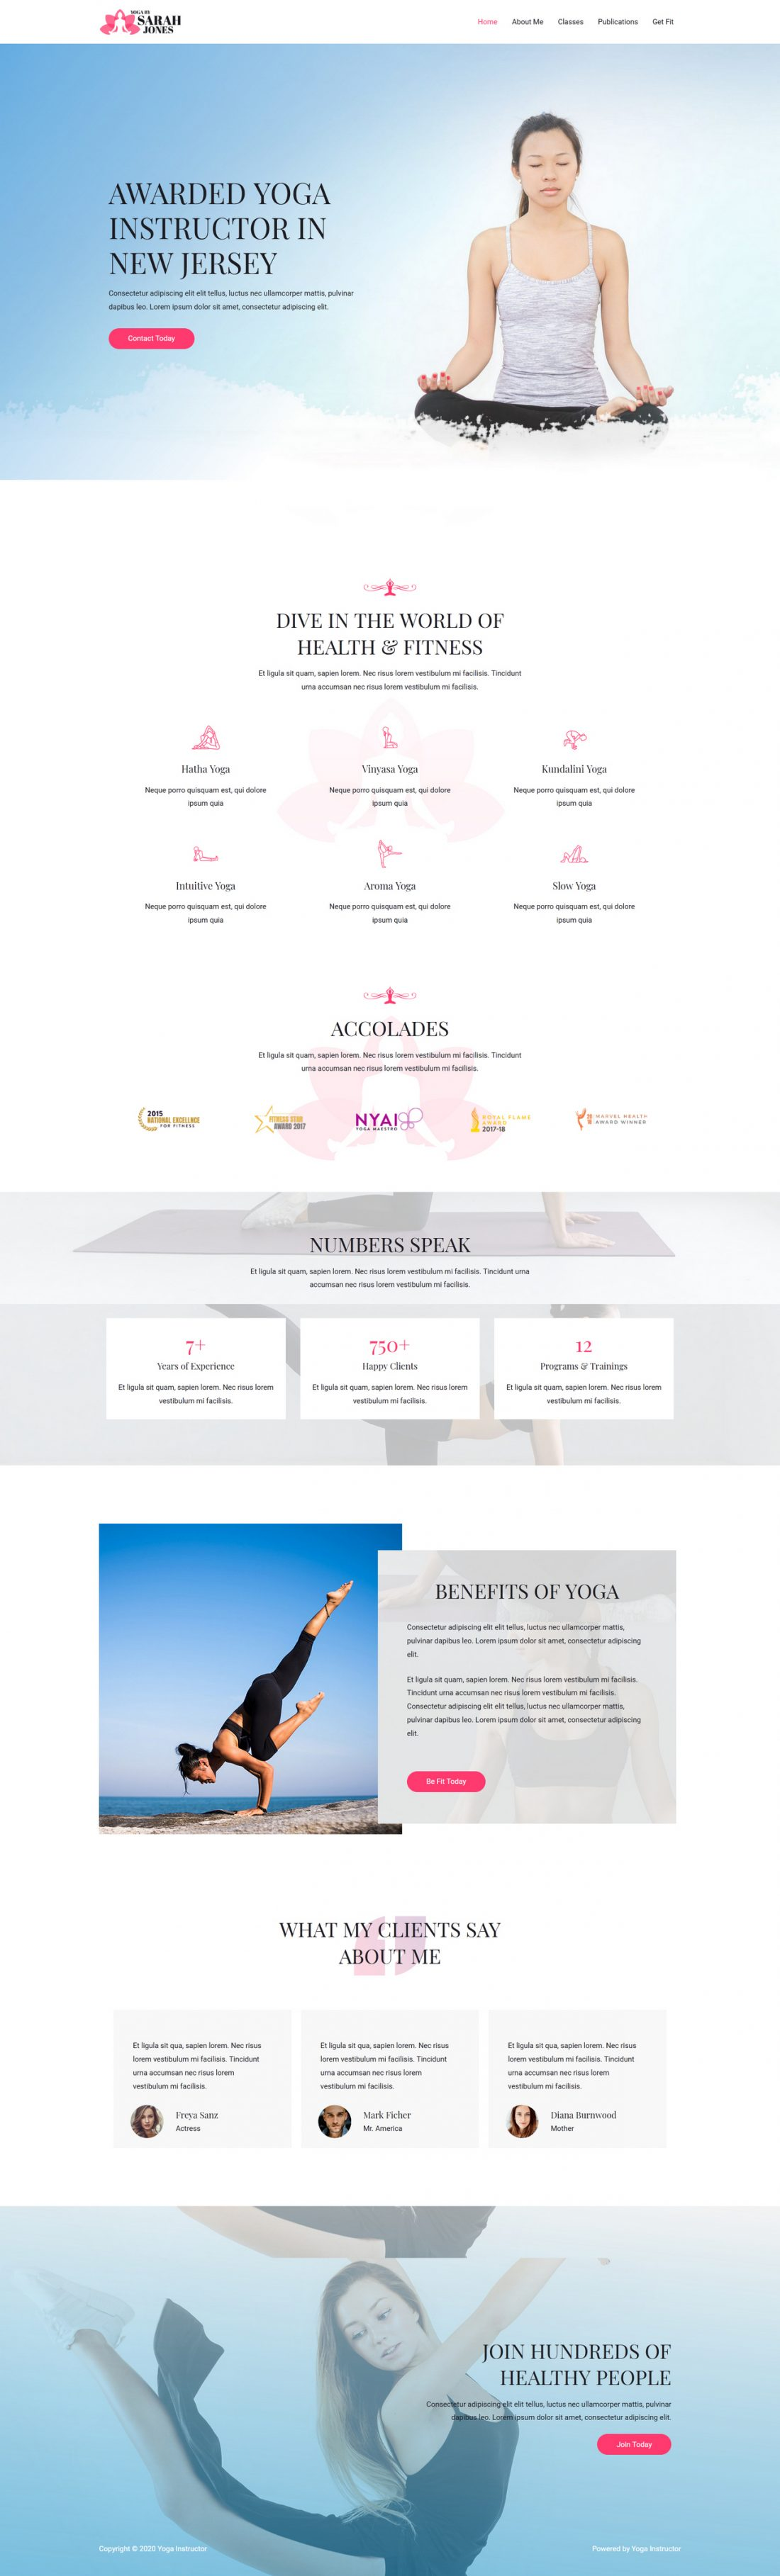 Fagowi.com Website Design Templates For Yoga Instructor - Home Page Image